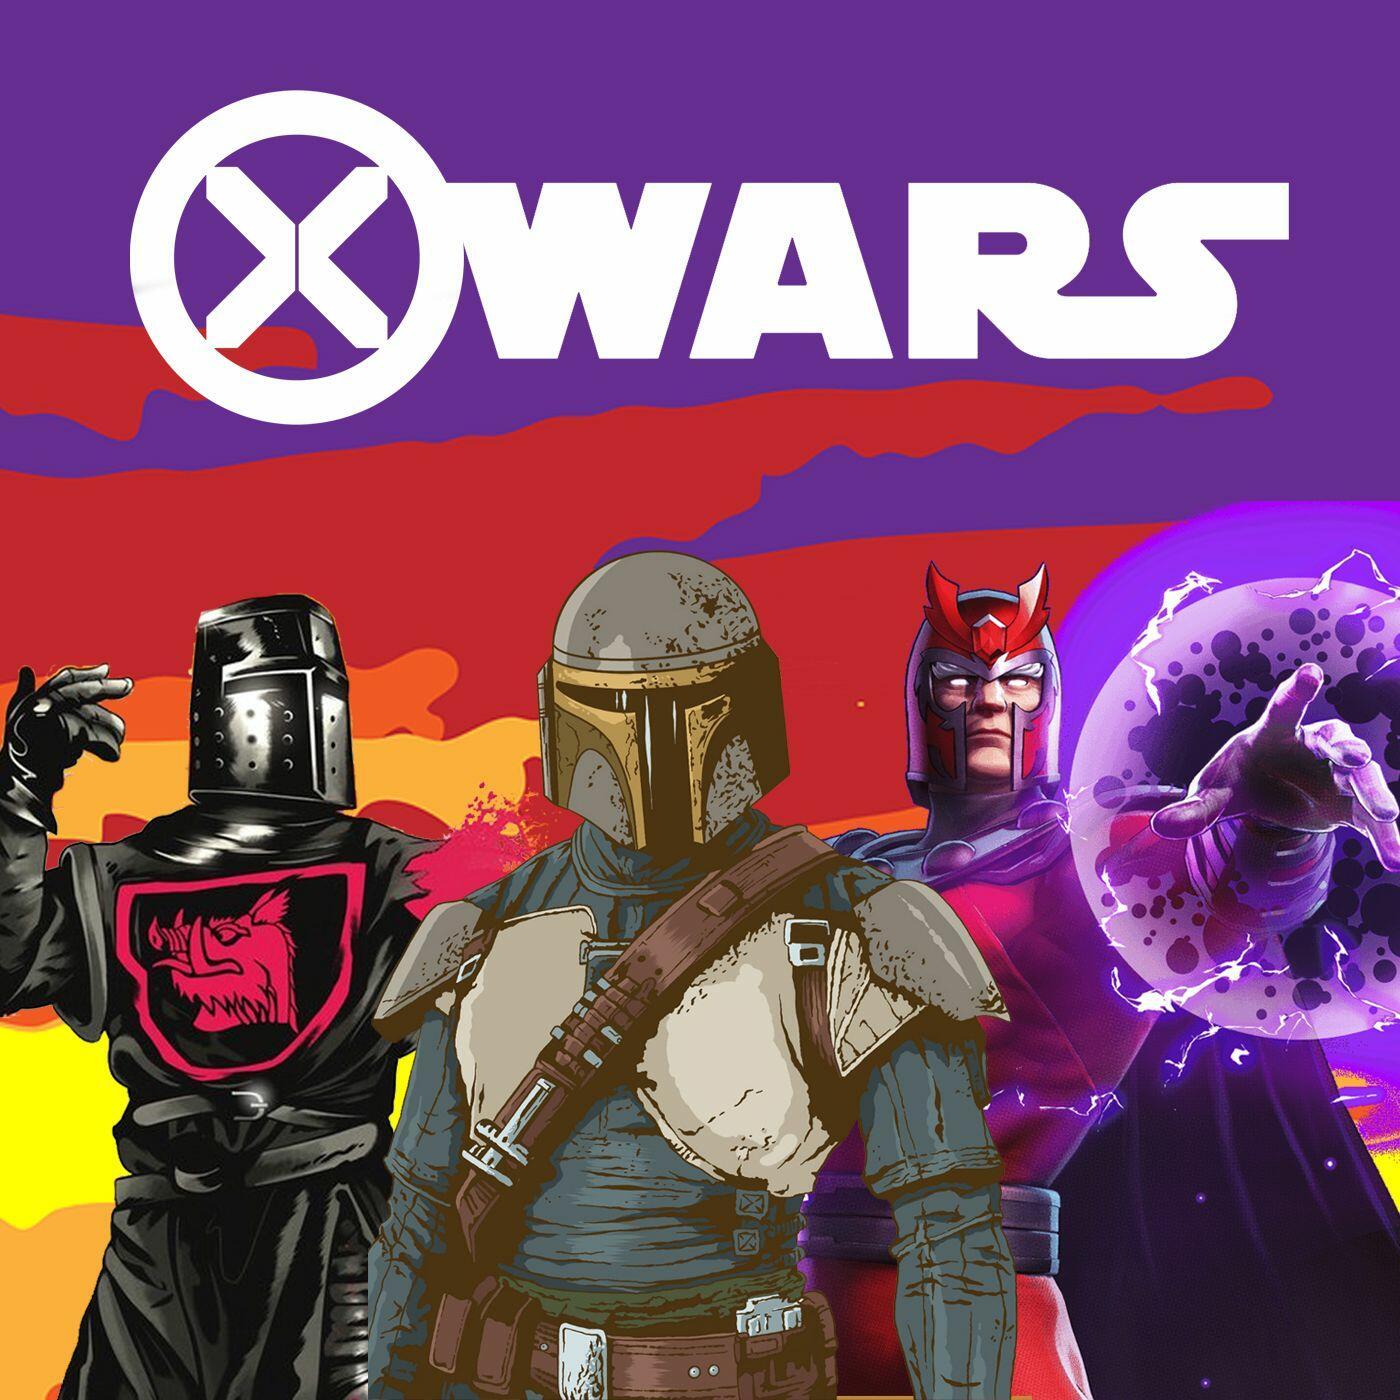 Xwars Podcast